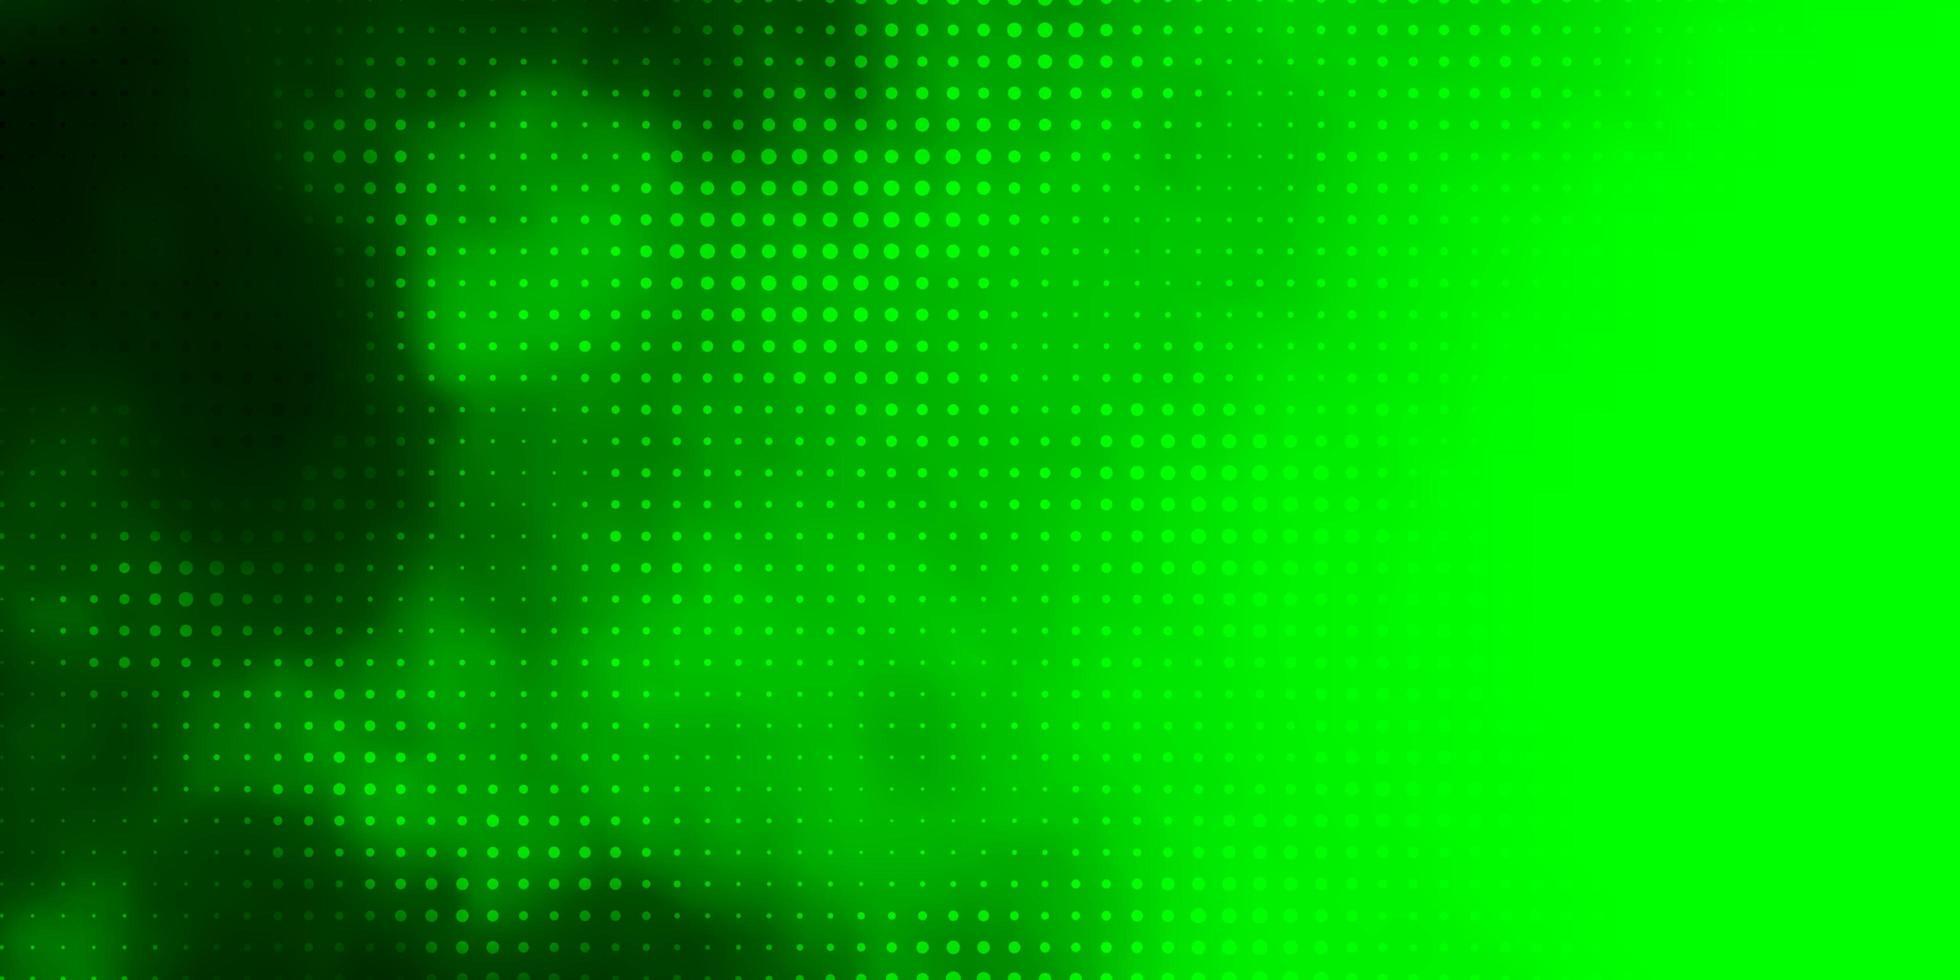 grünes Muster mit Kugeln. vektor